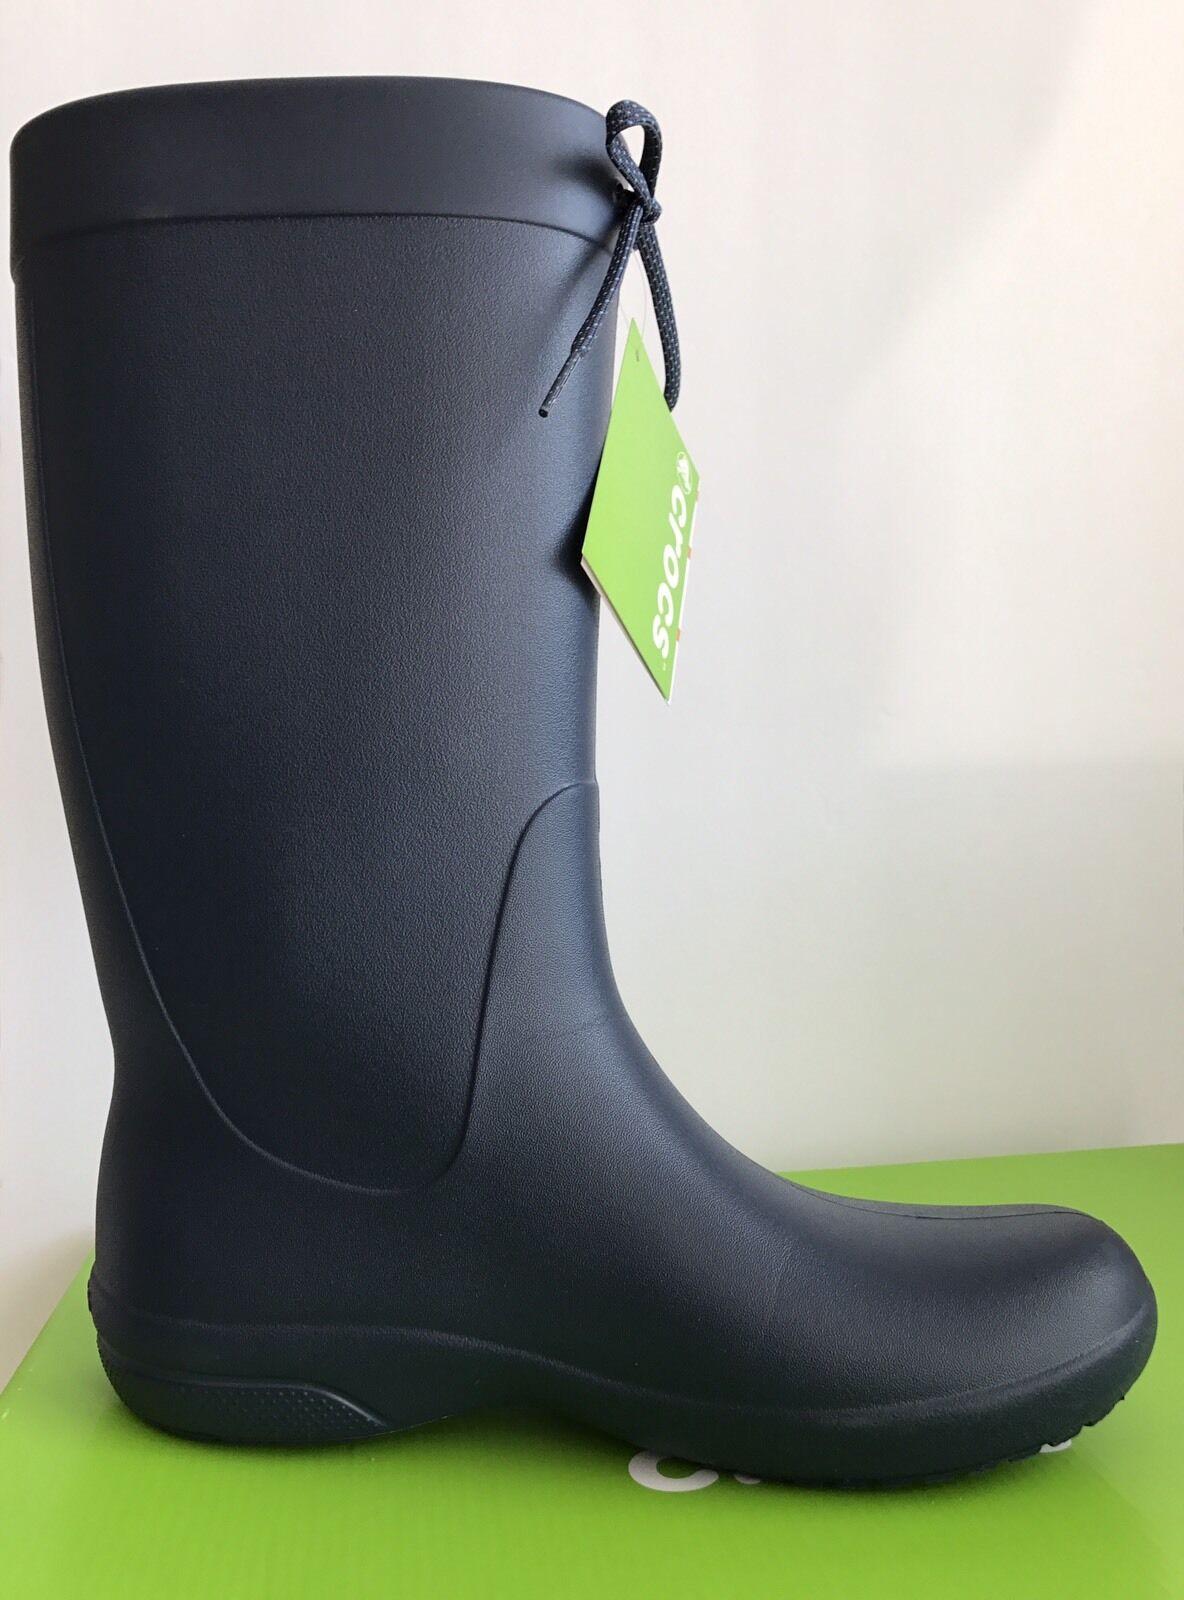 CROSS freesail Women's Rain Boots Relaxed Fit